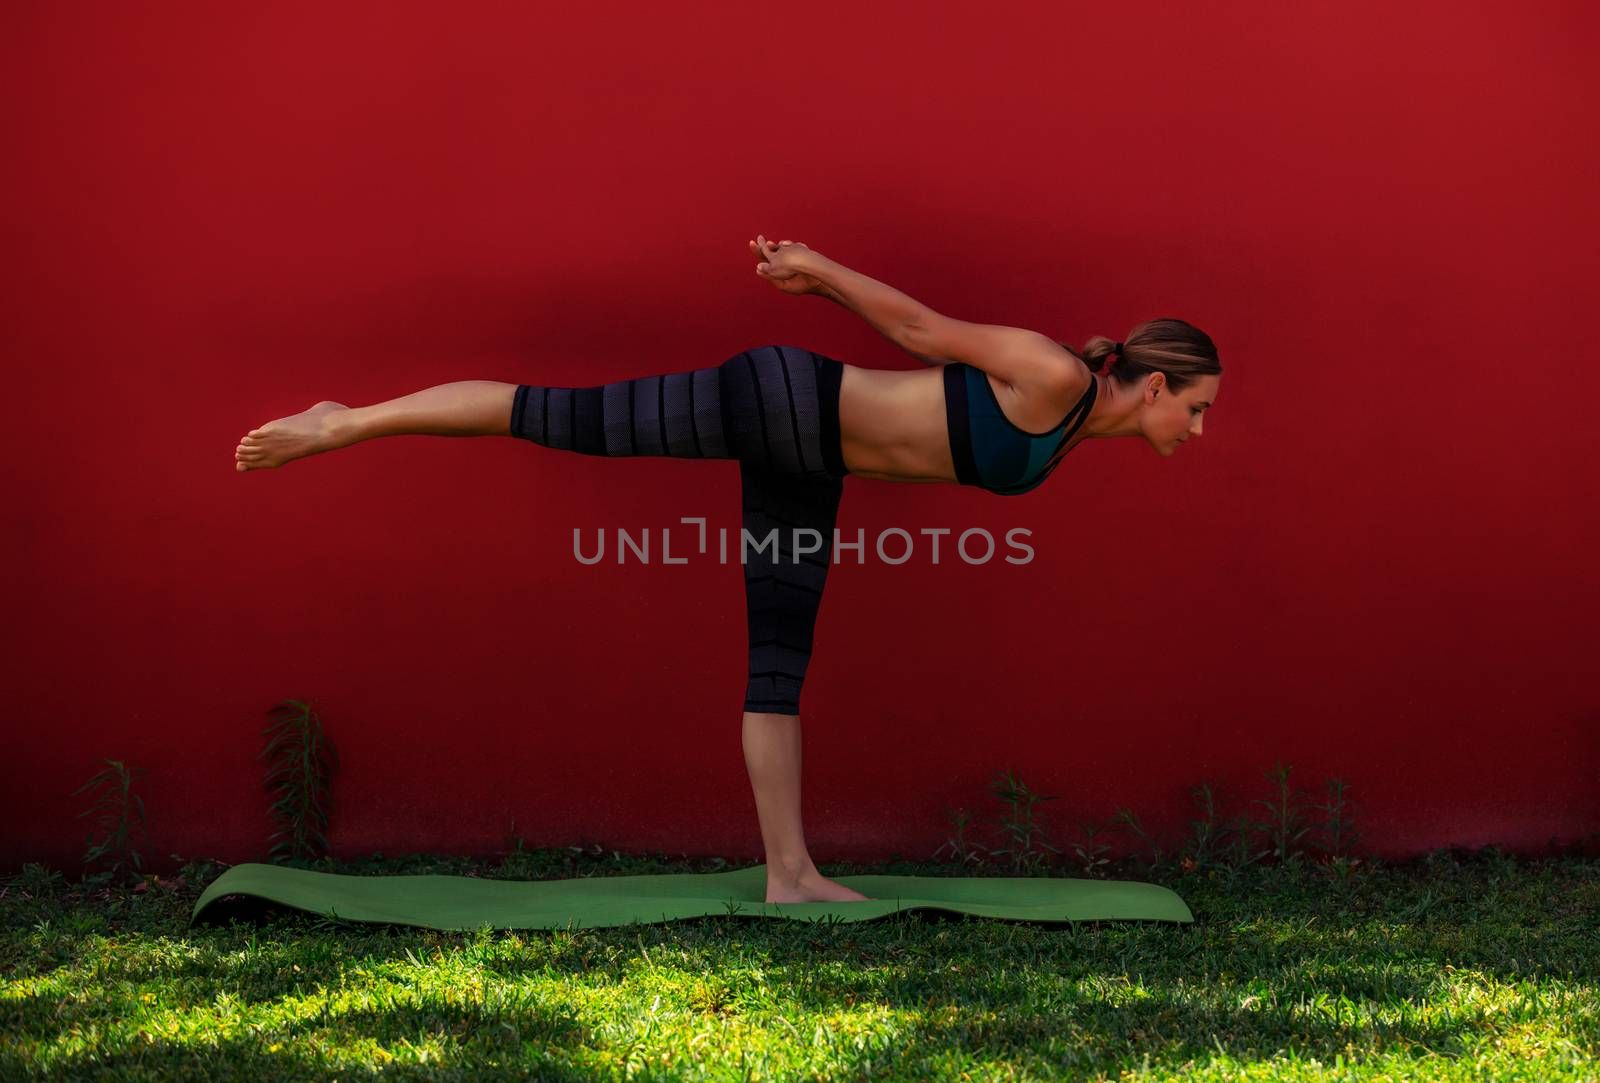 Beautiful Young Woman Doing Yoga Outdoors. Virabhadrasana. Warrior 3. One-Legged Pose. Enjoying Healthy Life and Sport.